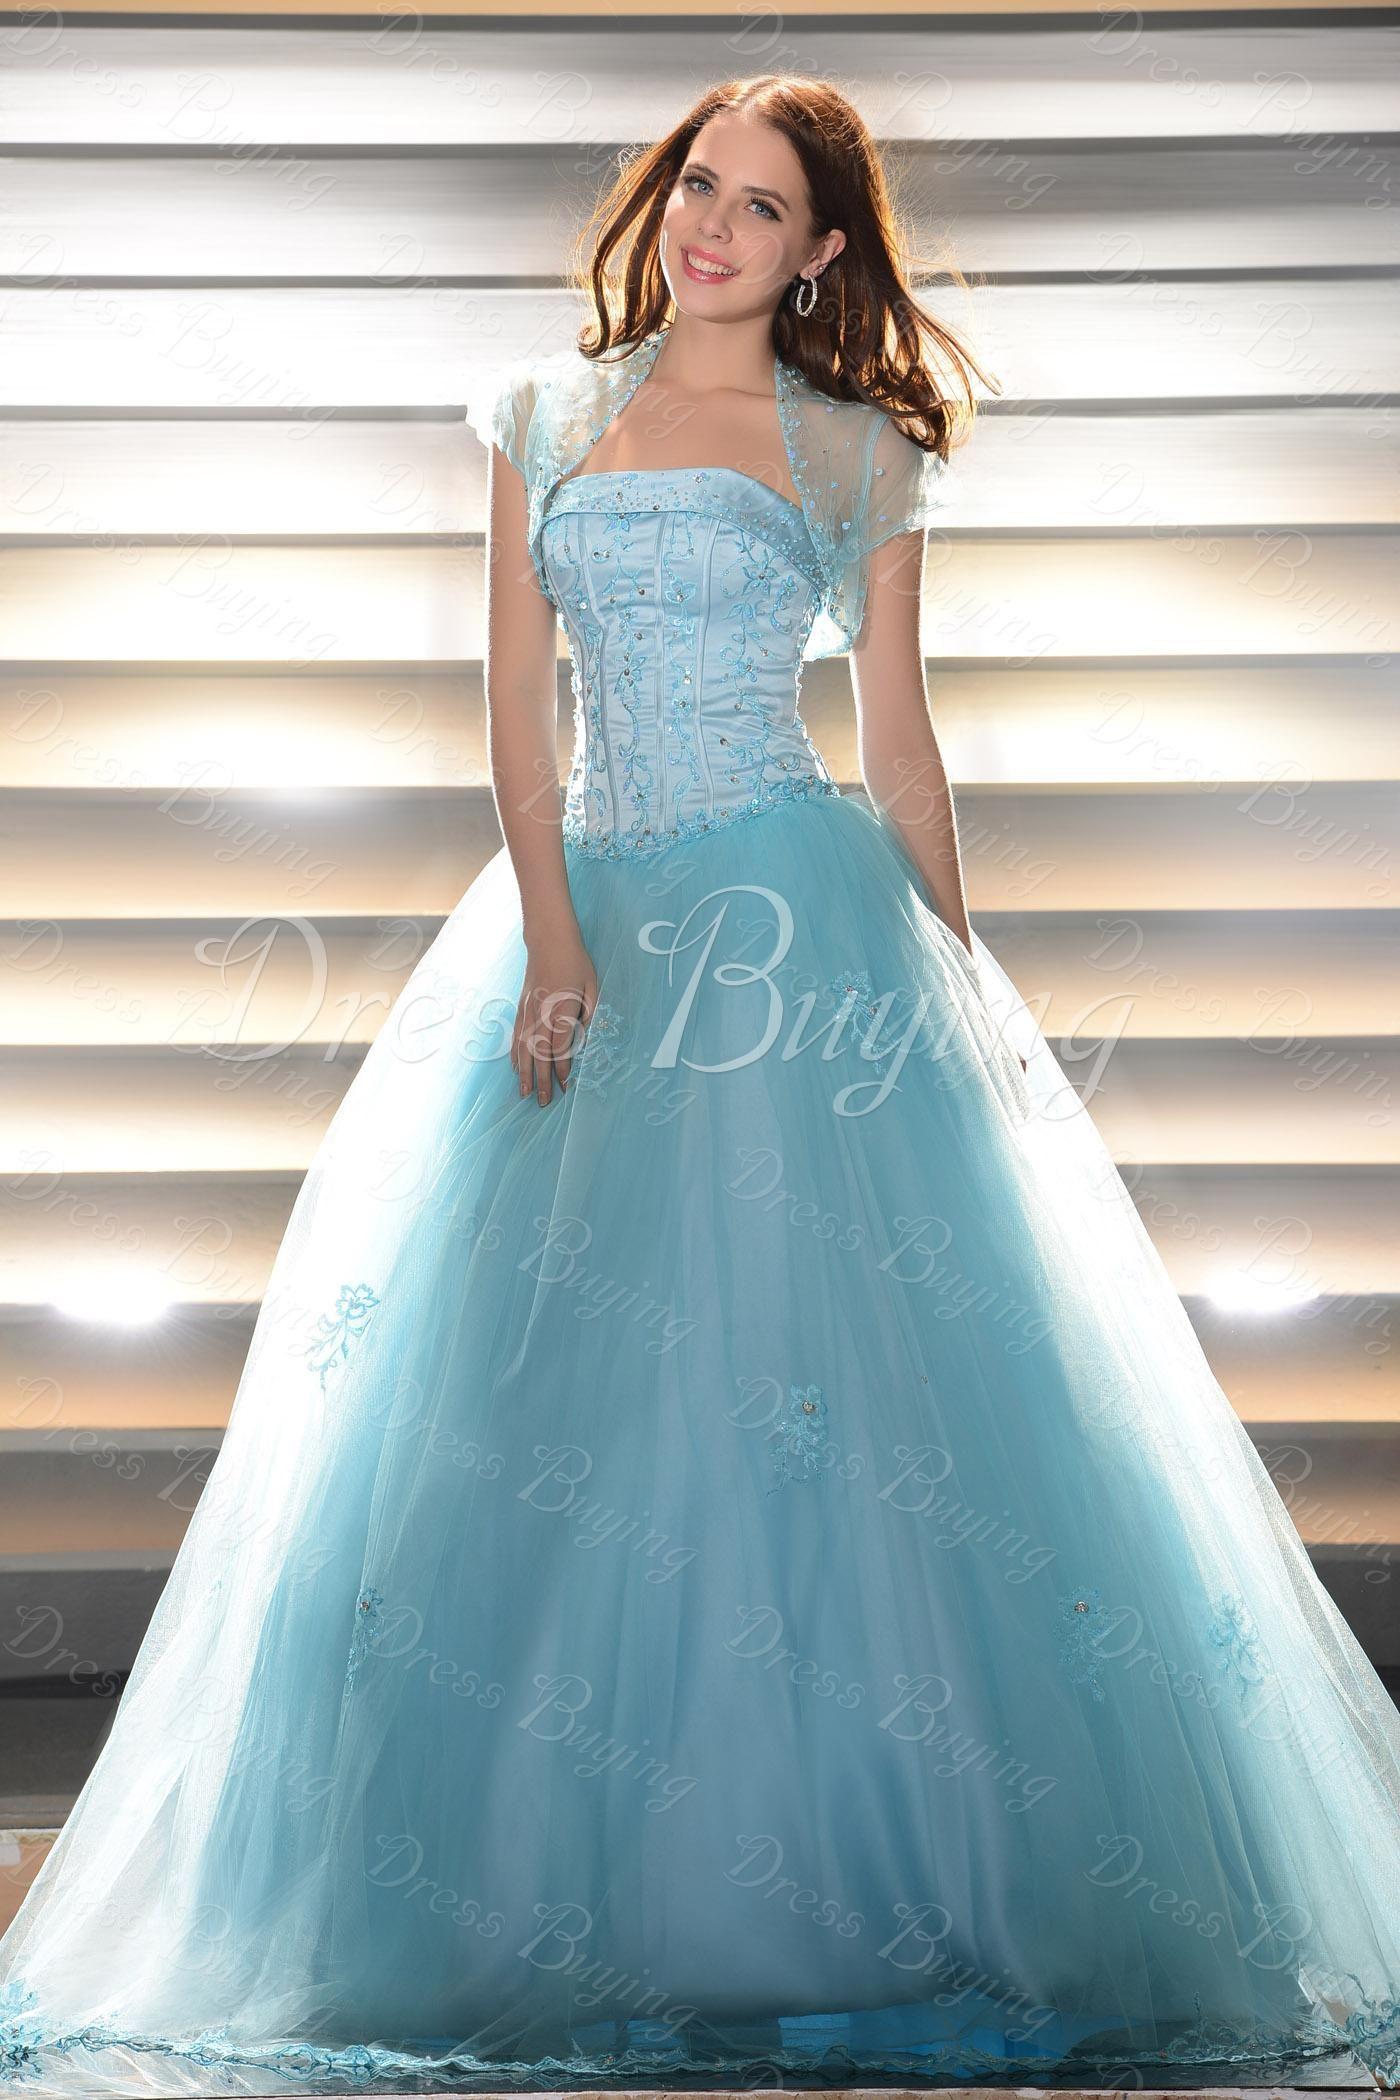 Fancy Ball Gown Quinceanera Dress $185.99   ladies tea- formal ball ...